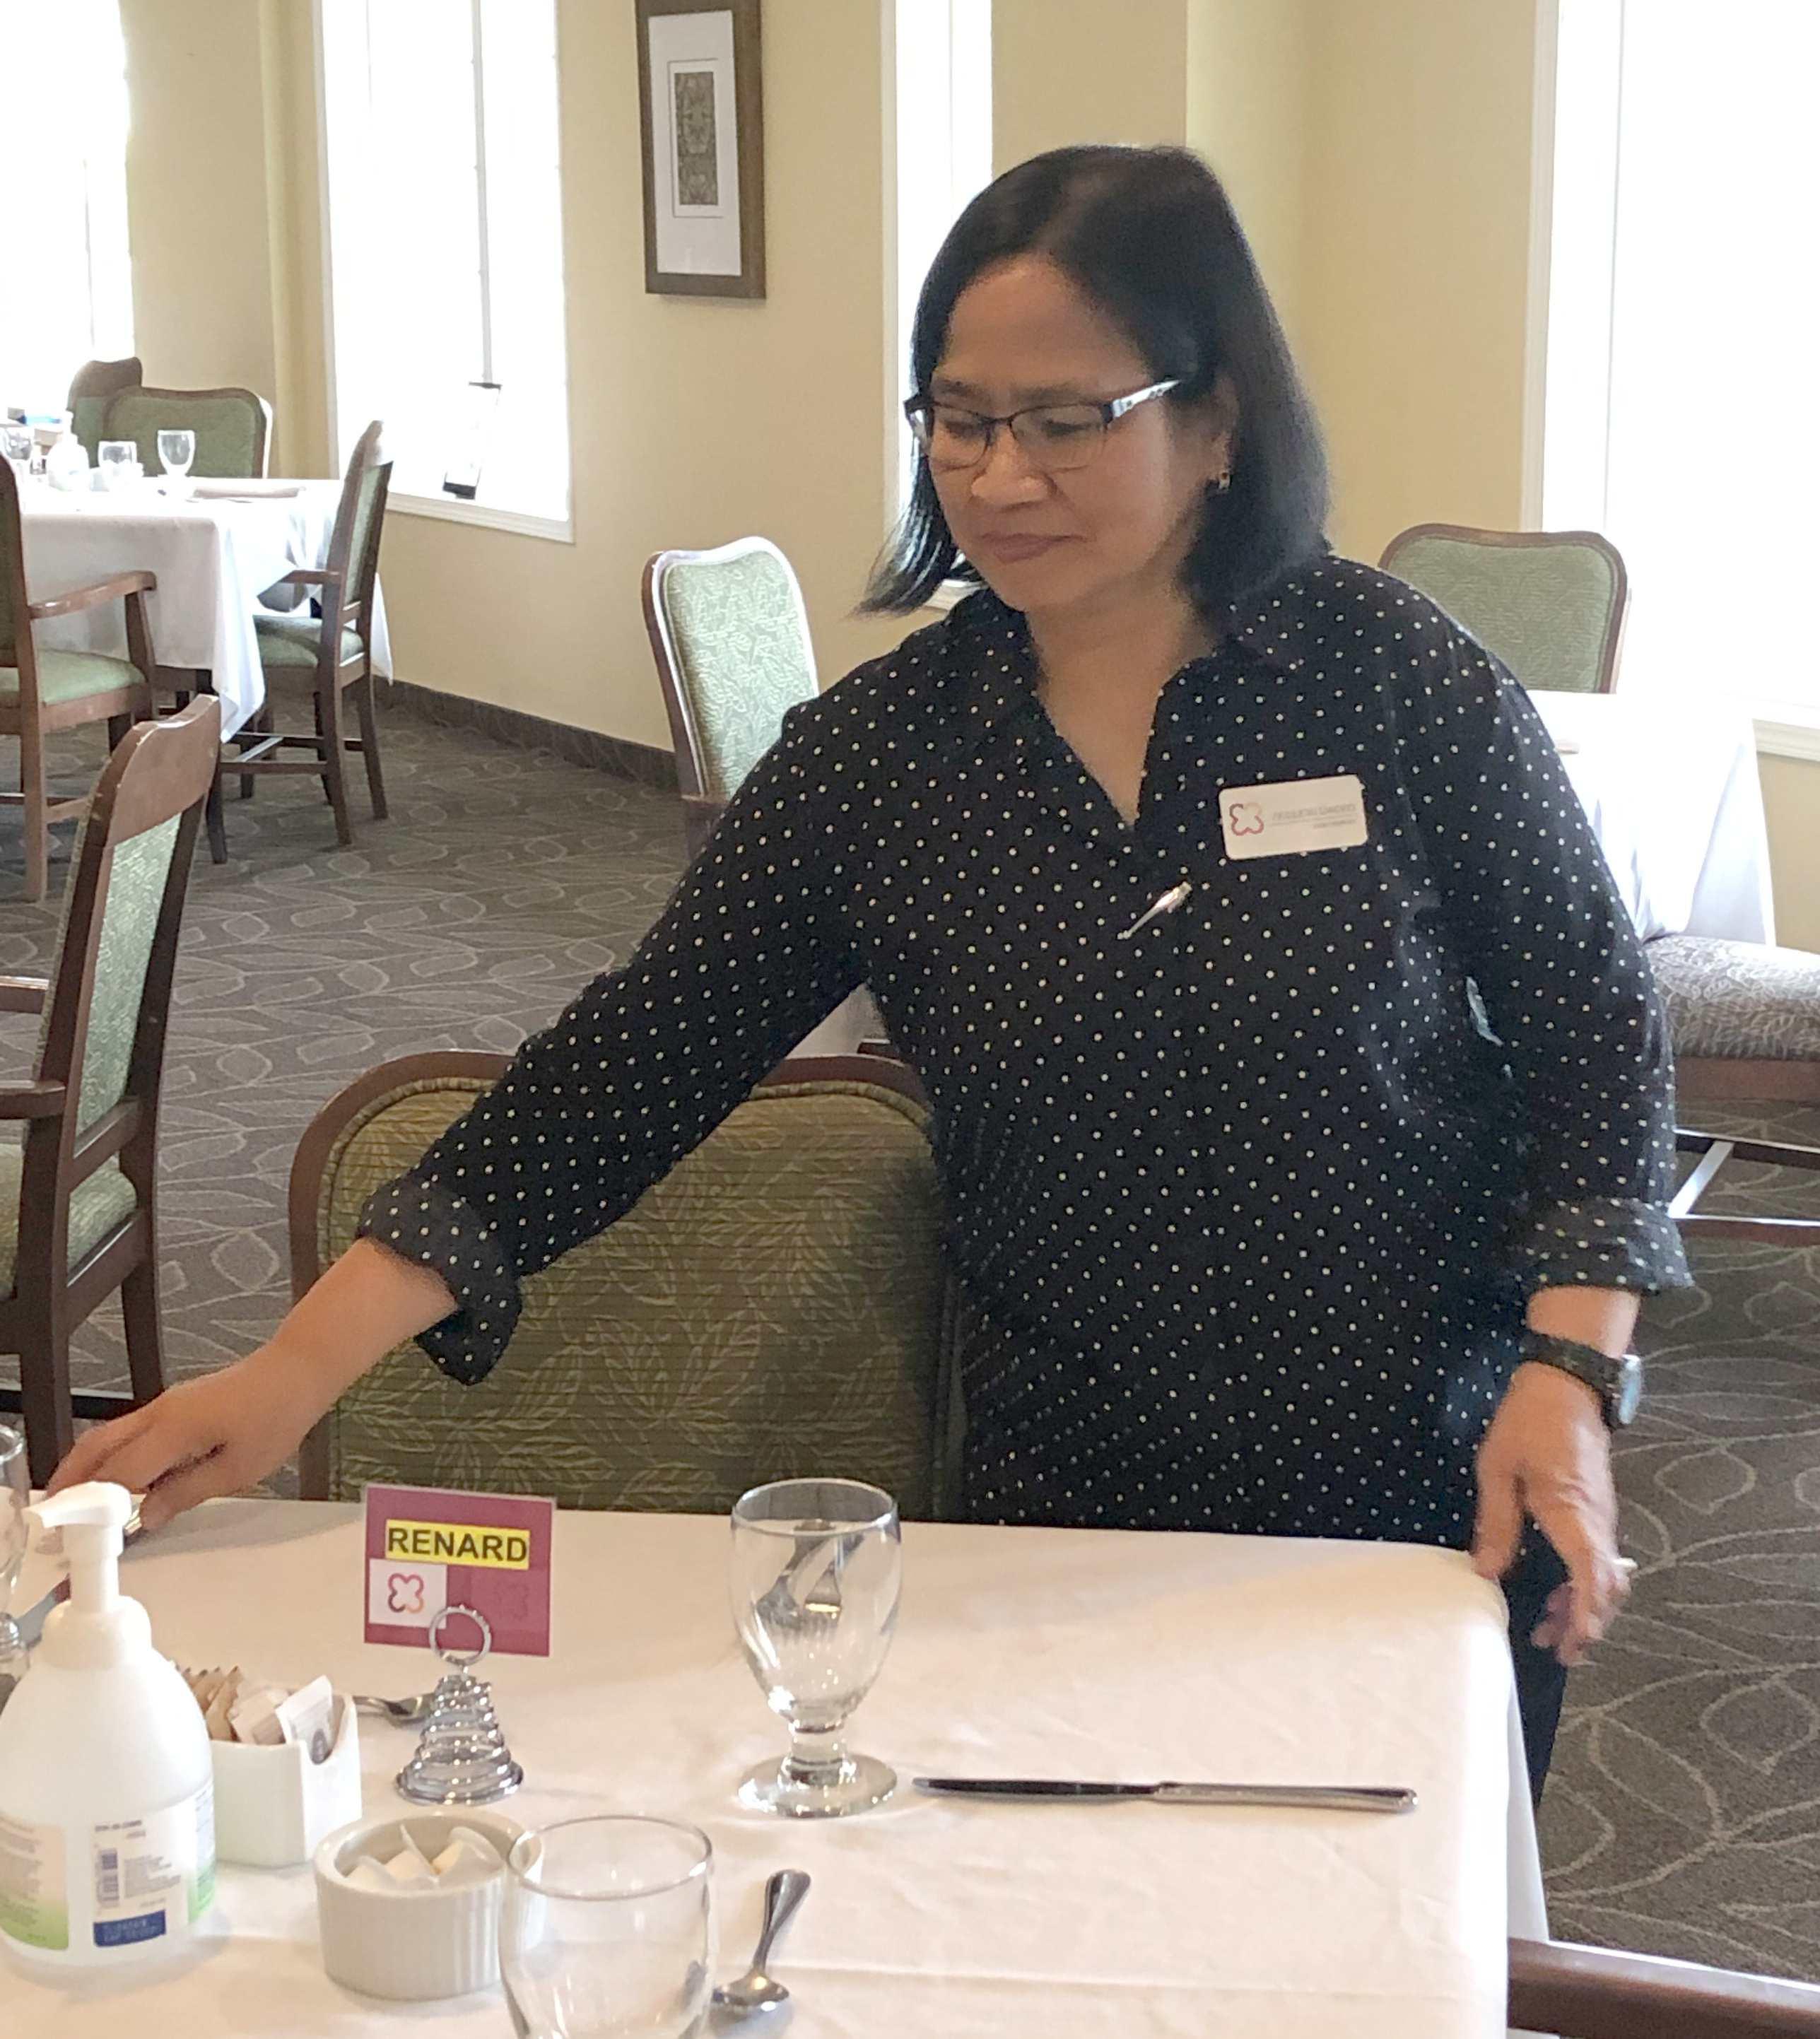 Violeta Cacho sets a table for four